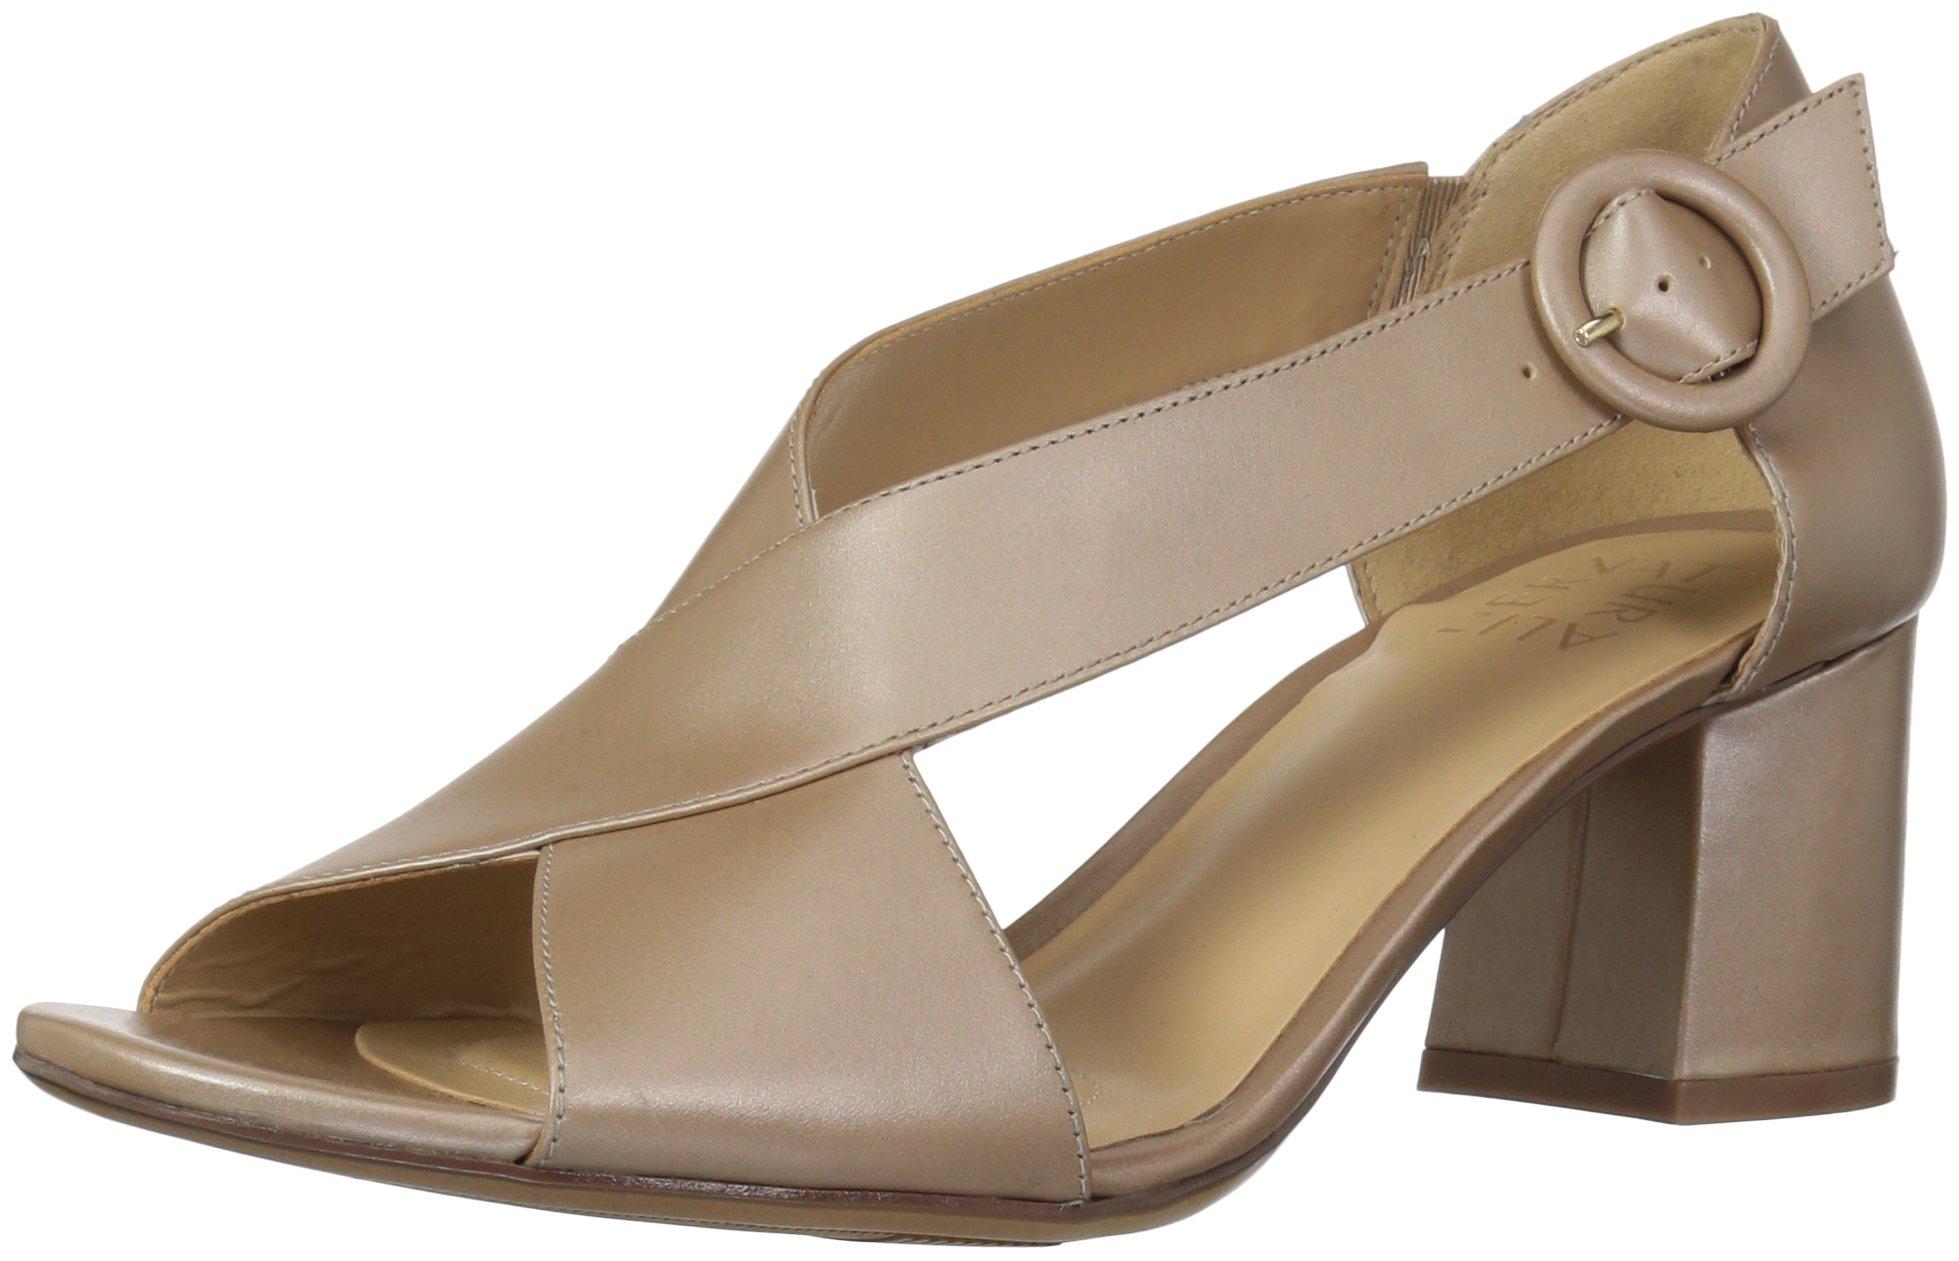 Naturalizer Women's Caden Dress Sandal, Taupe, 7 M US